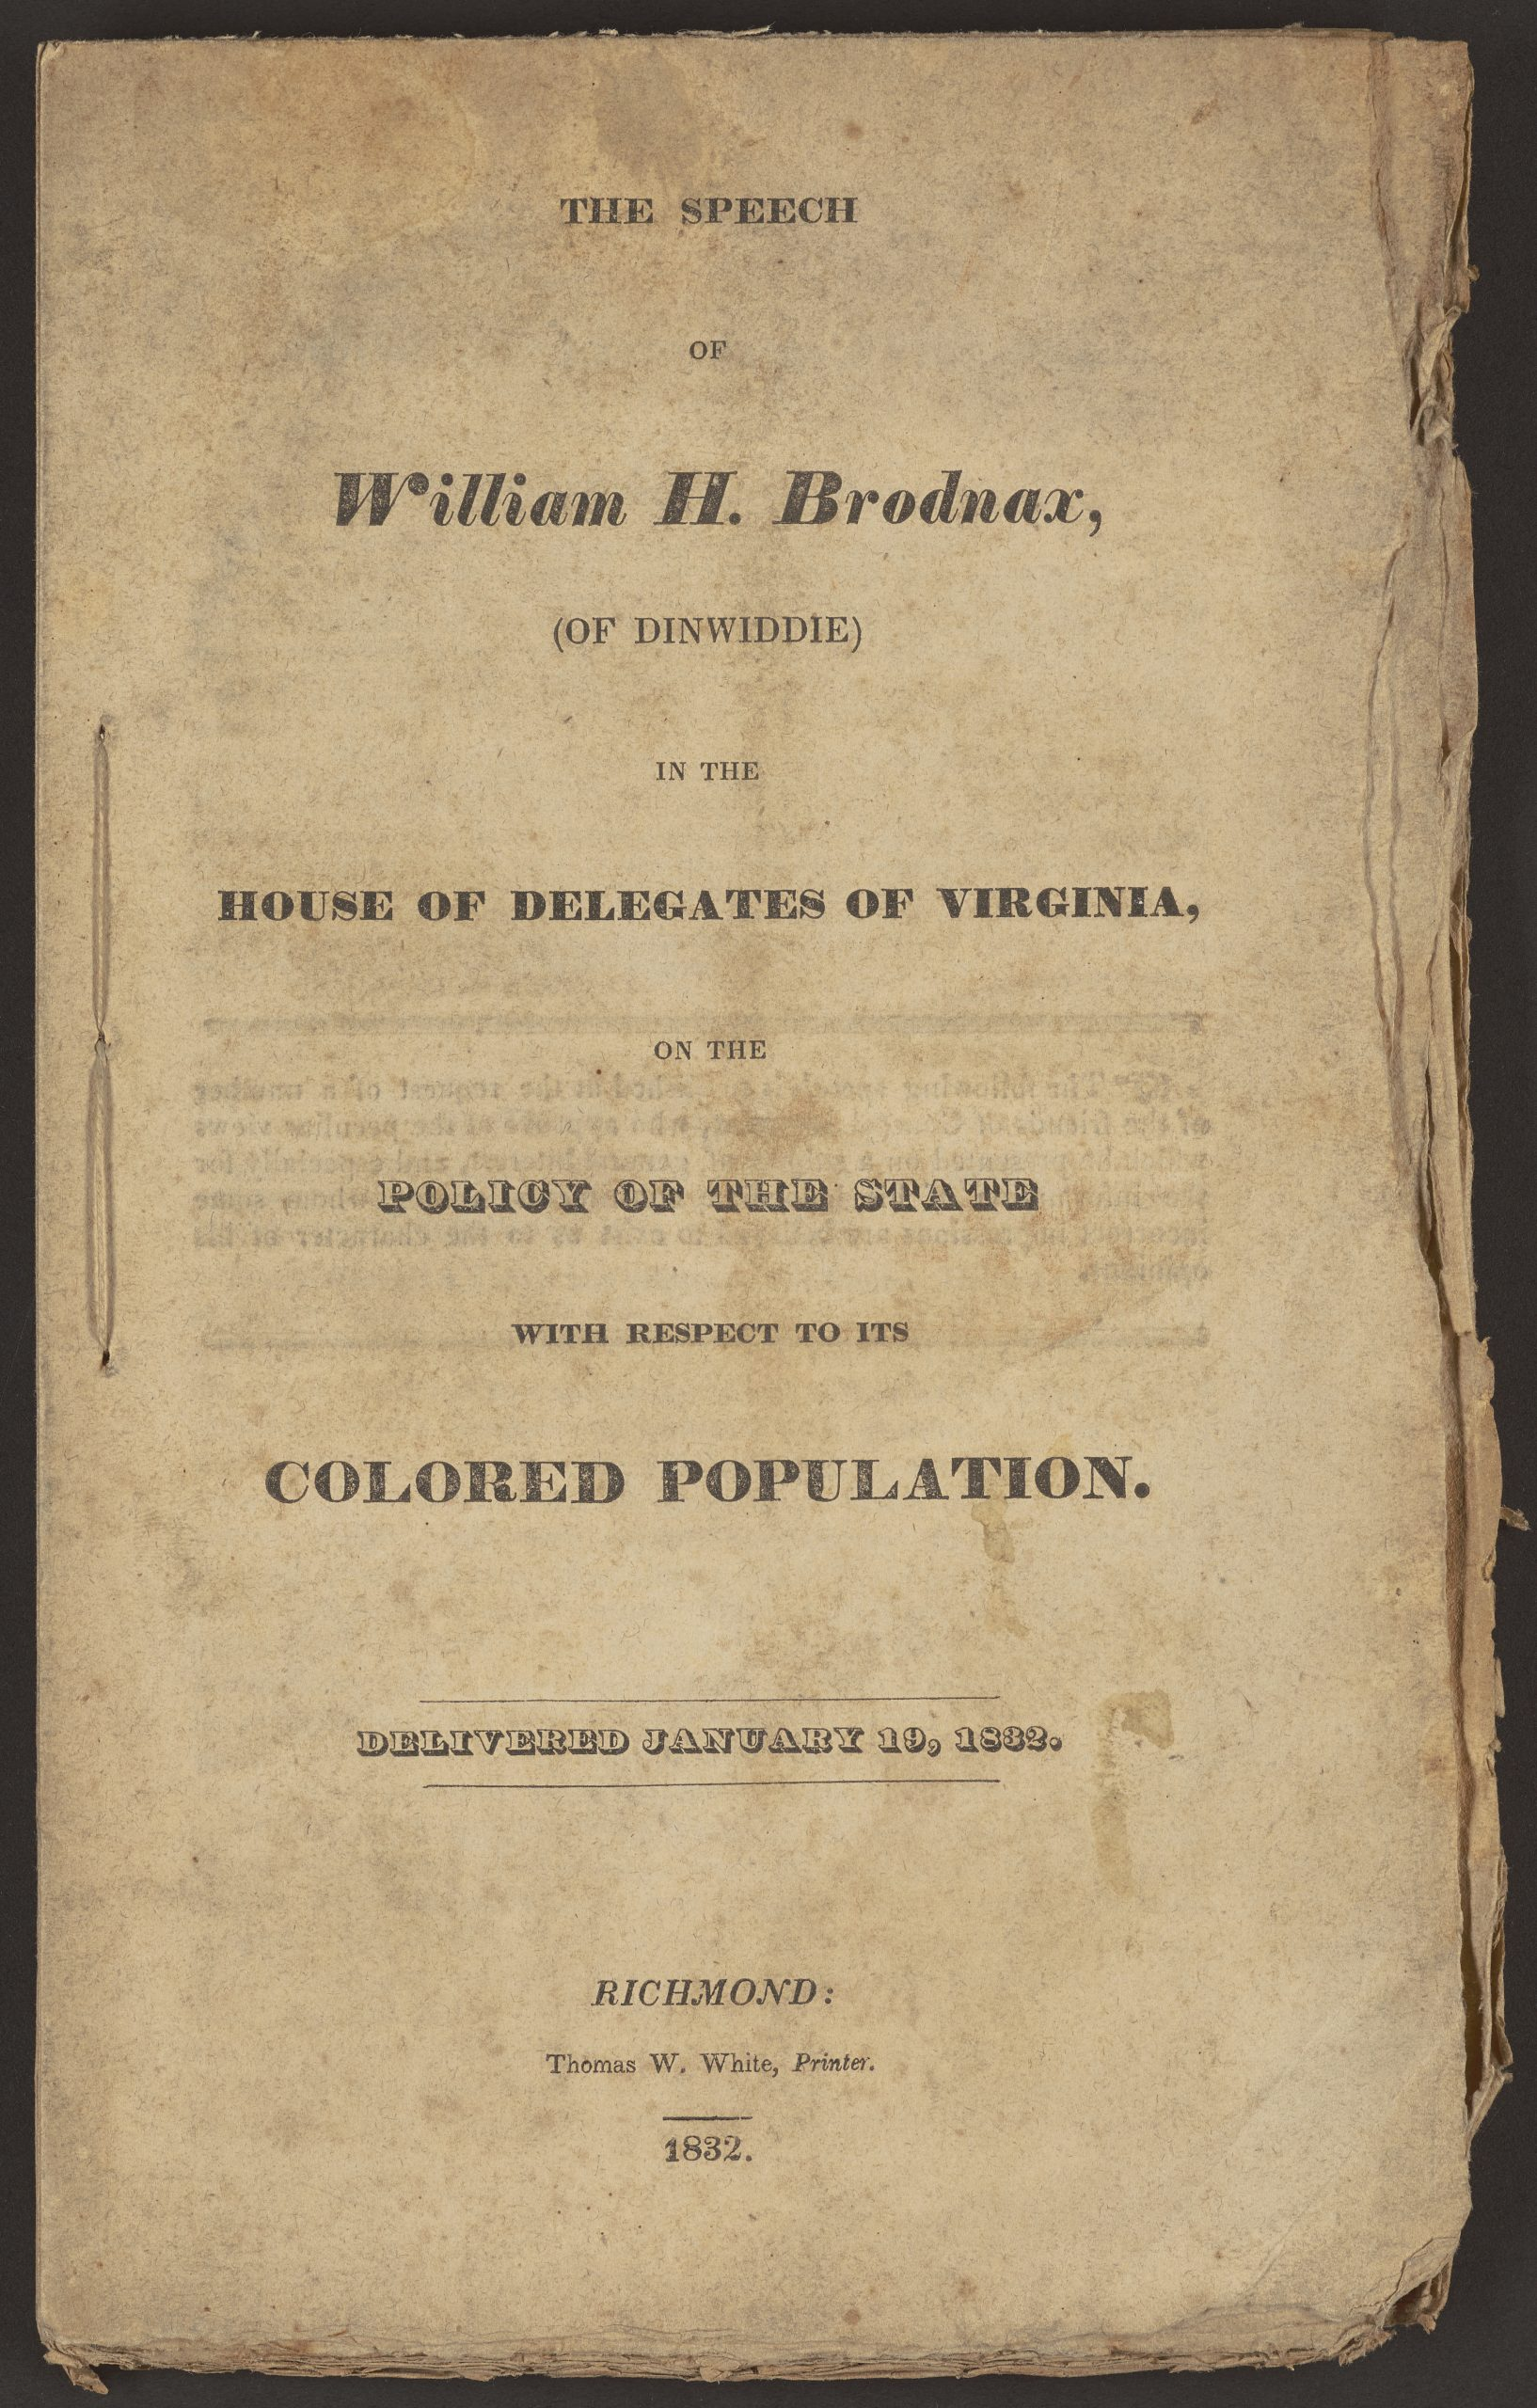 The Speech of William H. Brodnax